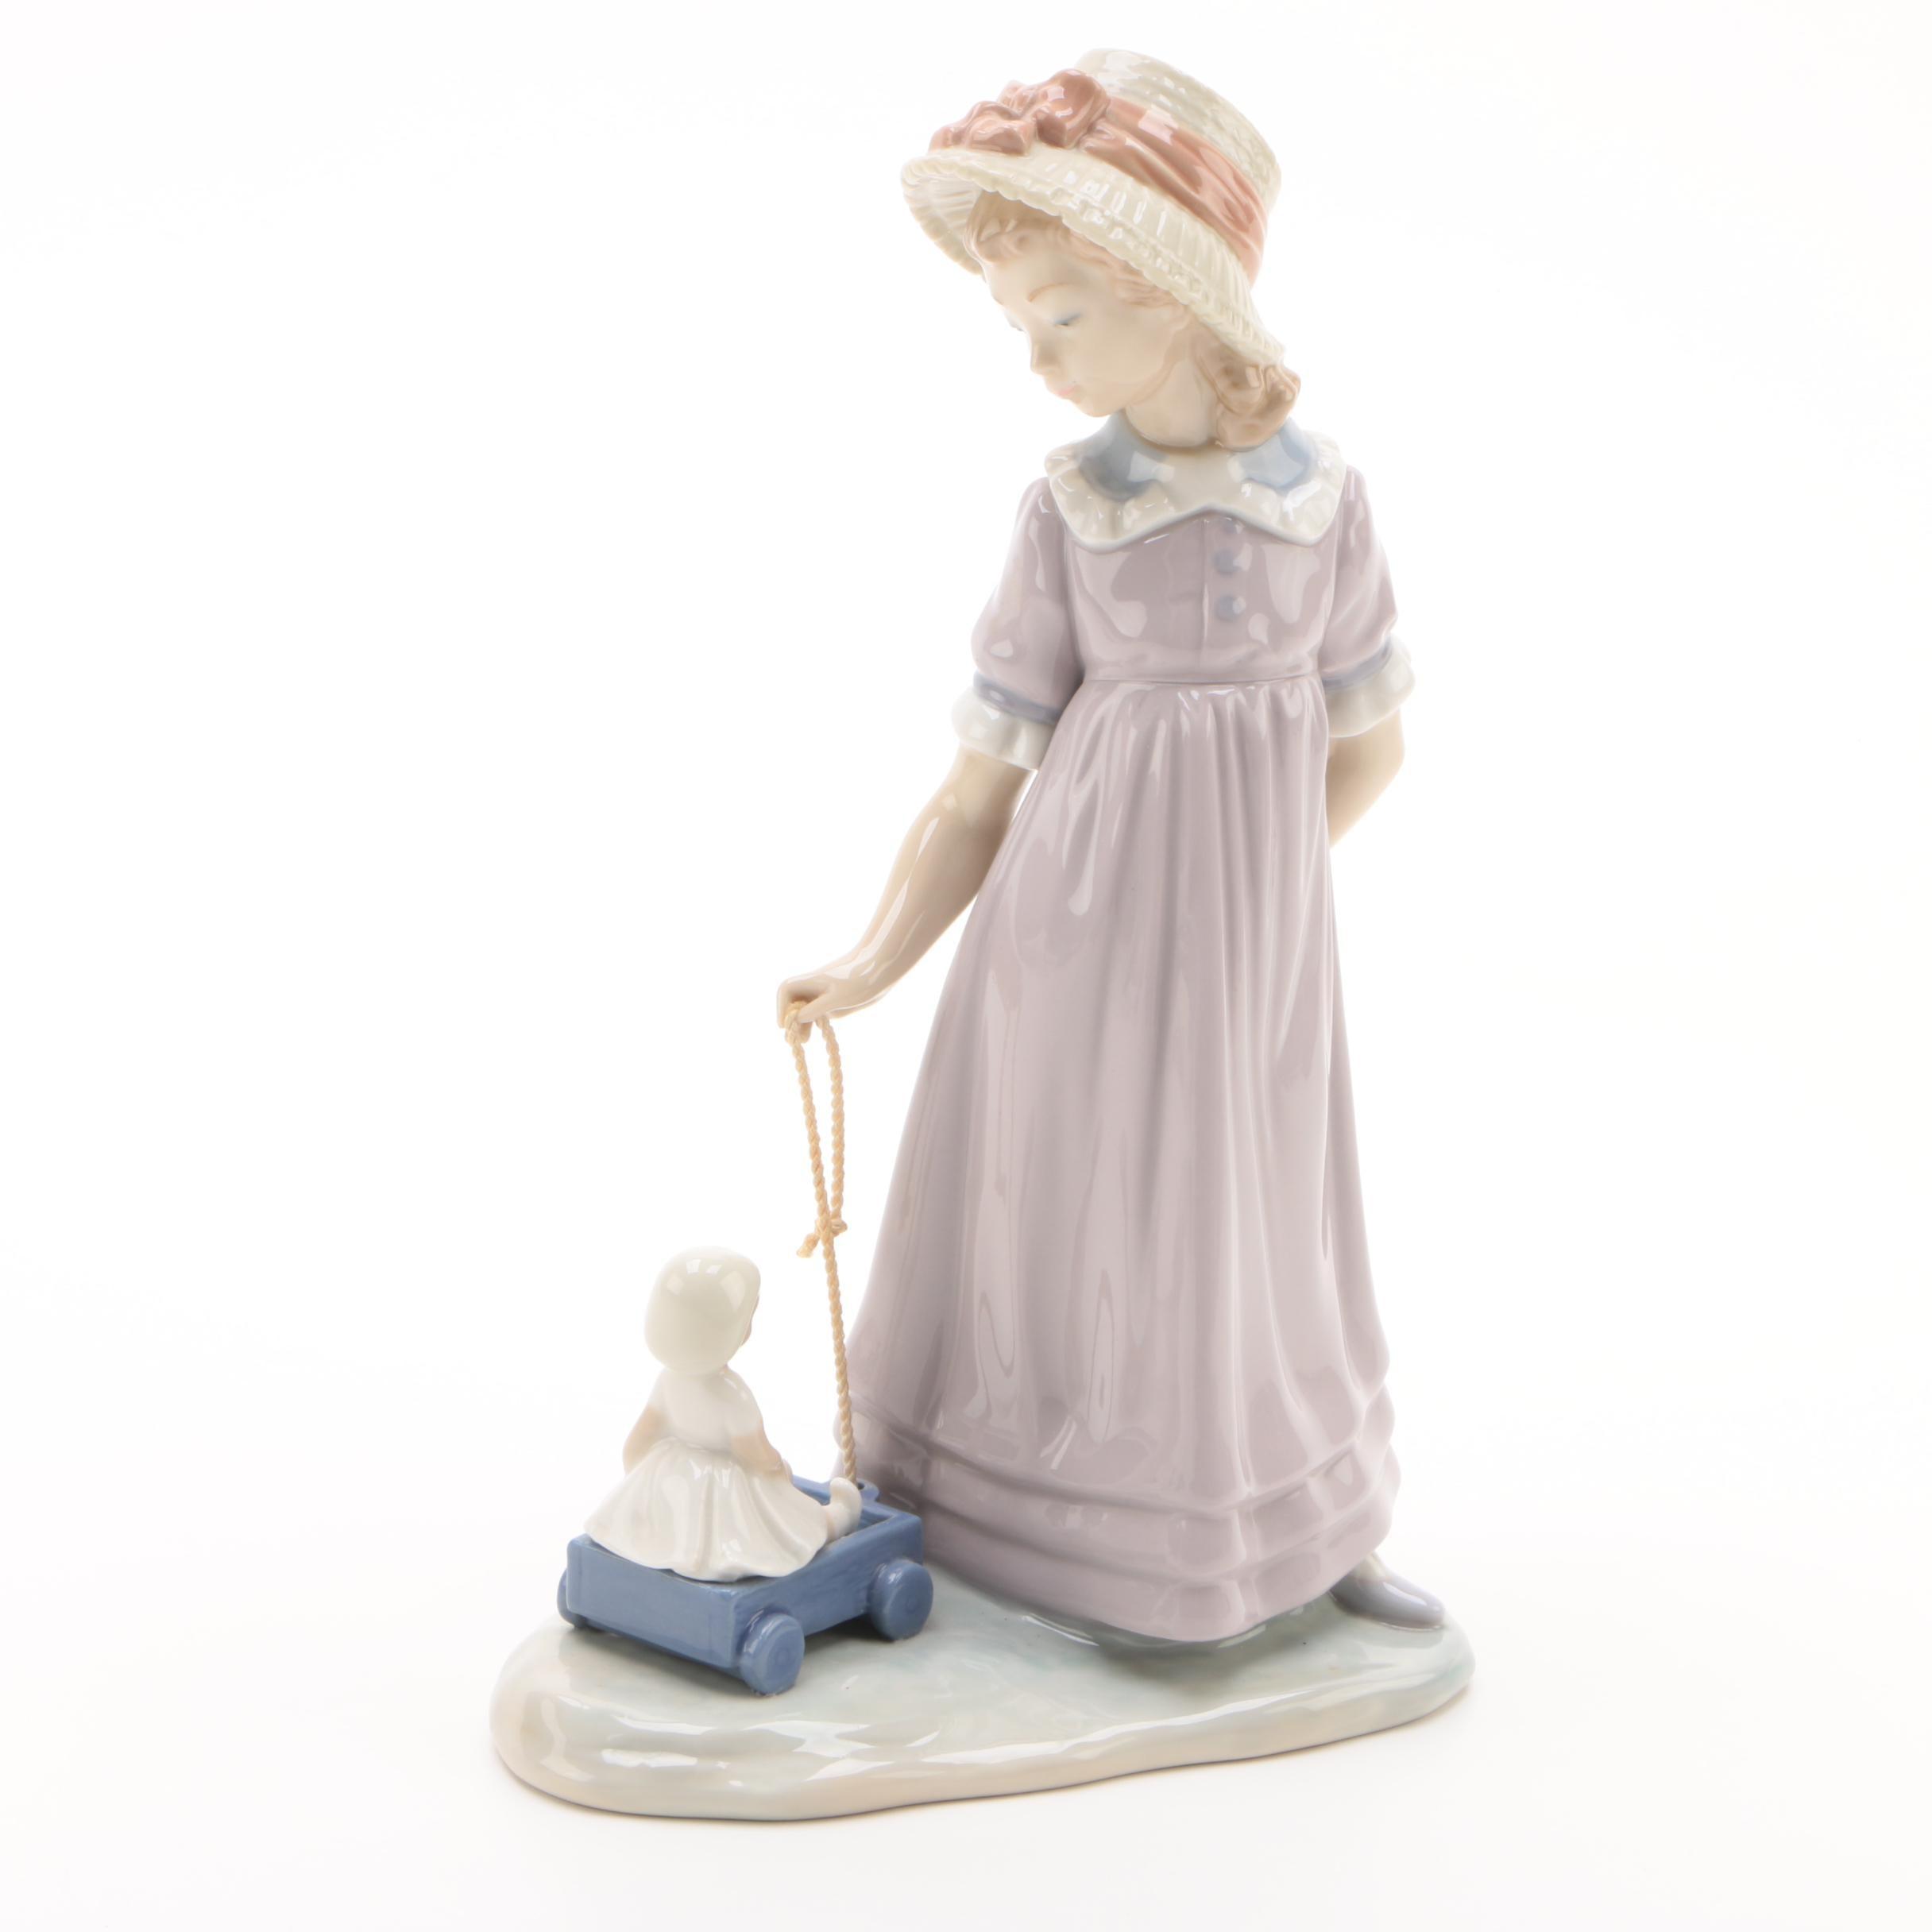 "Lladró ""Pulling Dolls Carriage"" Porcelain Figurine"